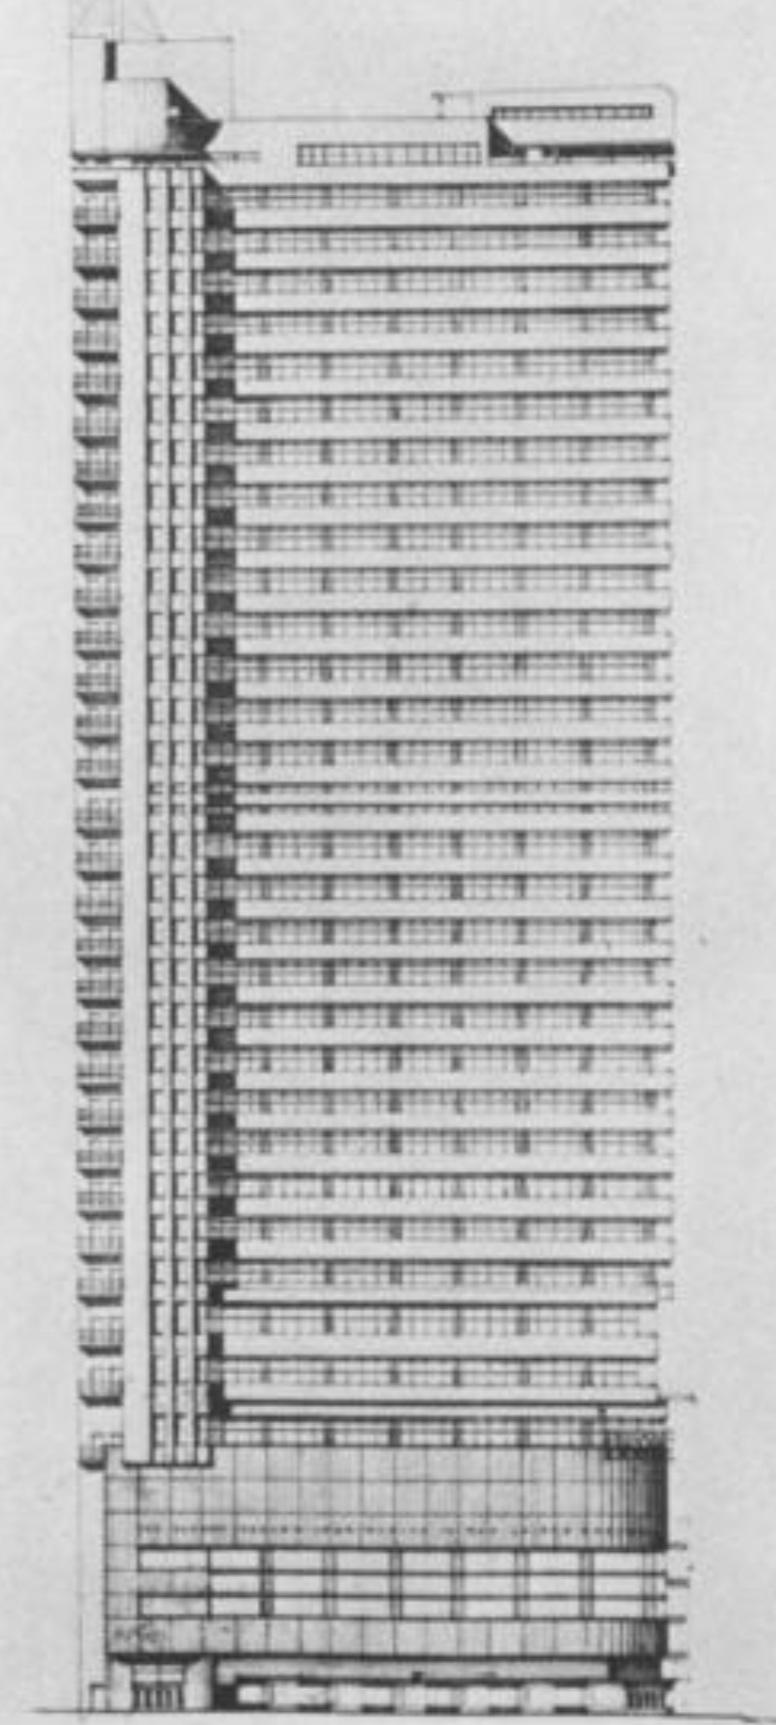 Fourth scheme of the PSFS Building. Image via George Howe and William Edmond Lescaze